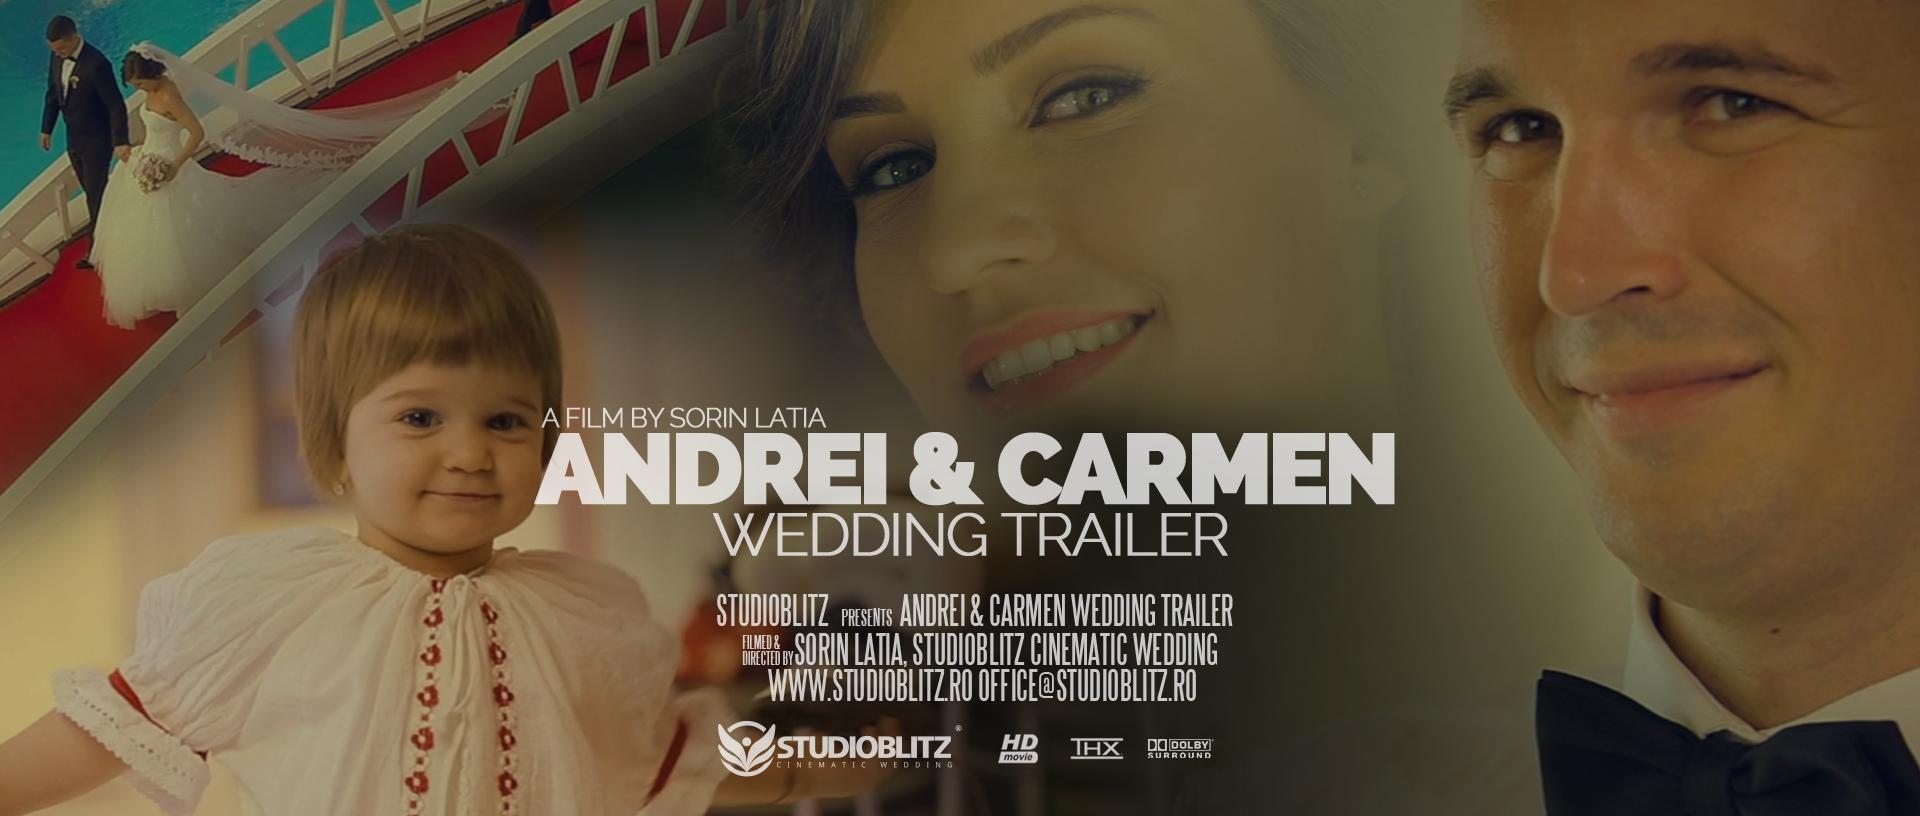 coperta-filmari-nunti-ana-events-targu-jiu-andrei-carmen-wedding-trailer1